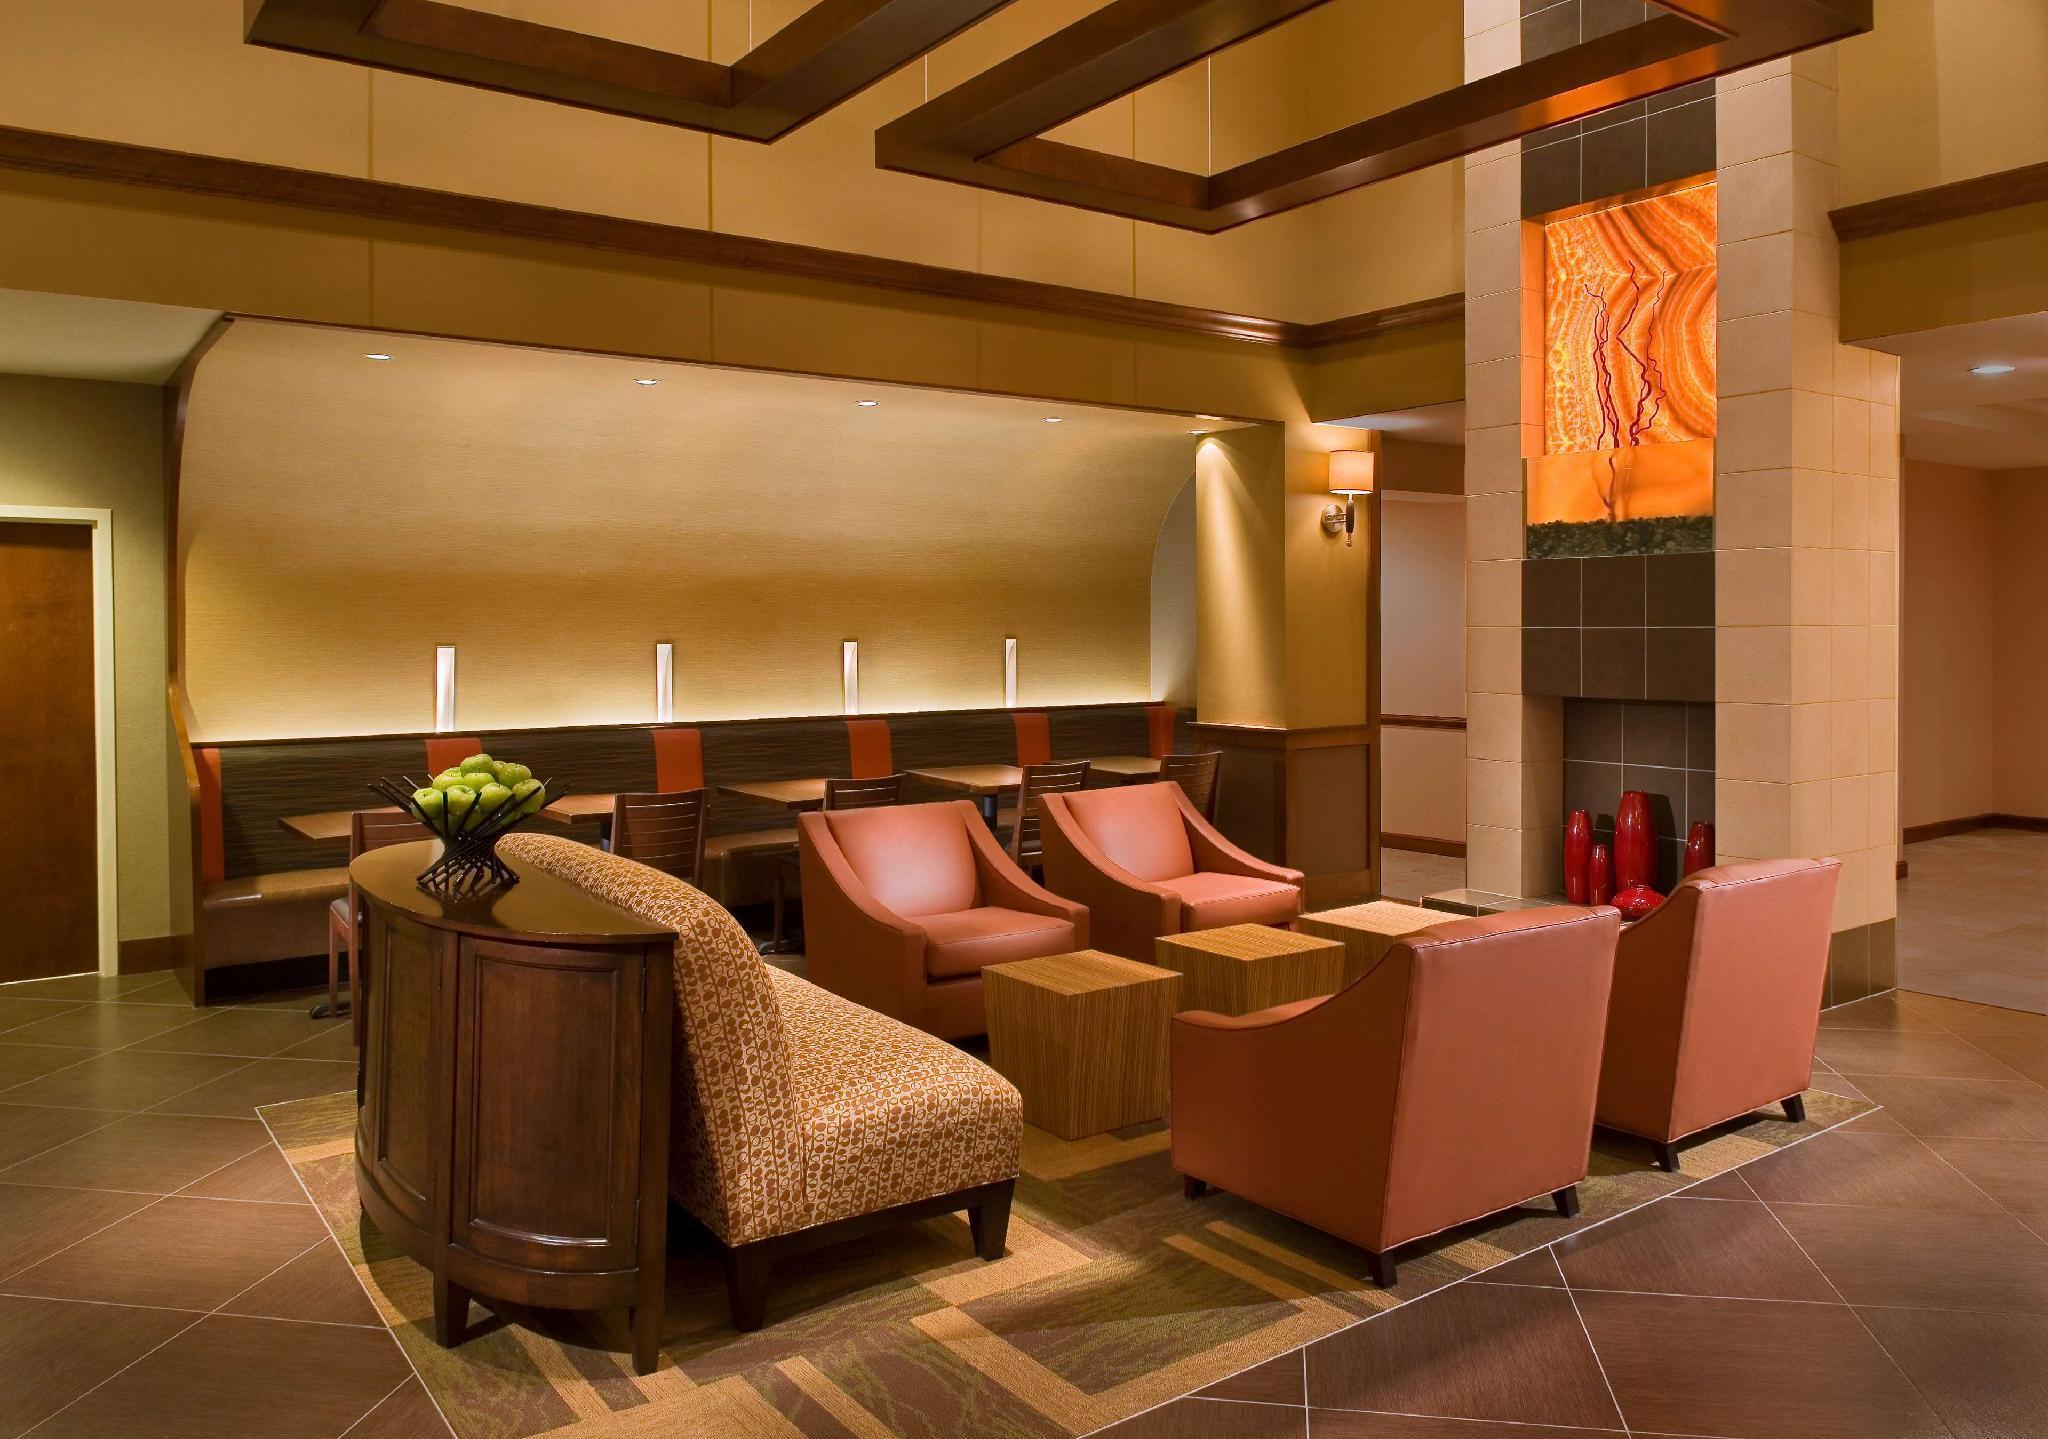 Hyatt Place San Antonio North Stone Oak